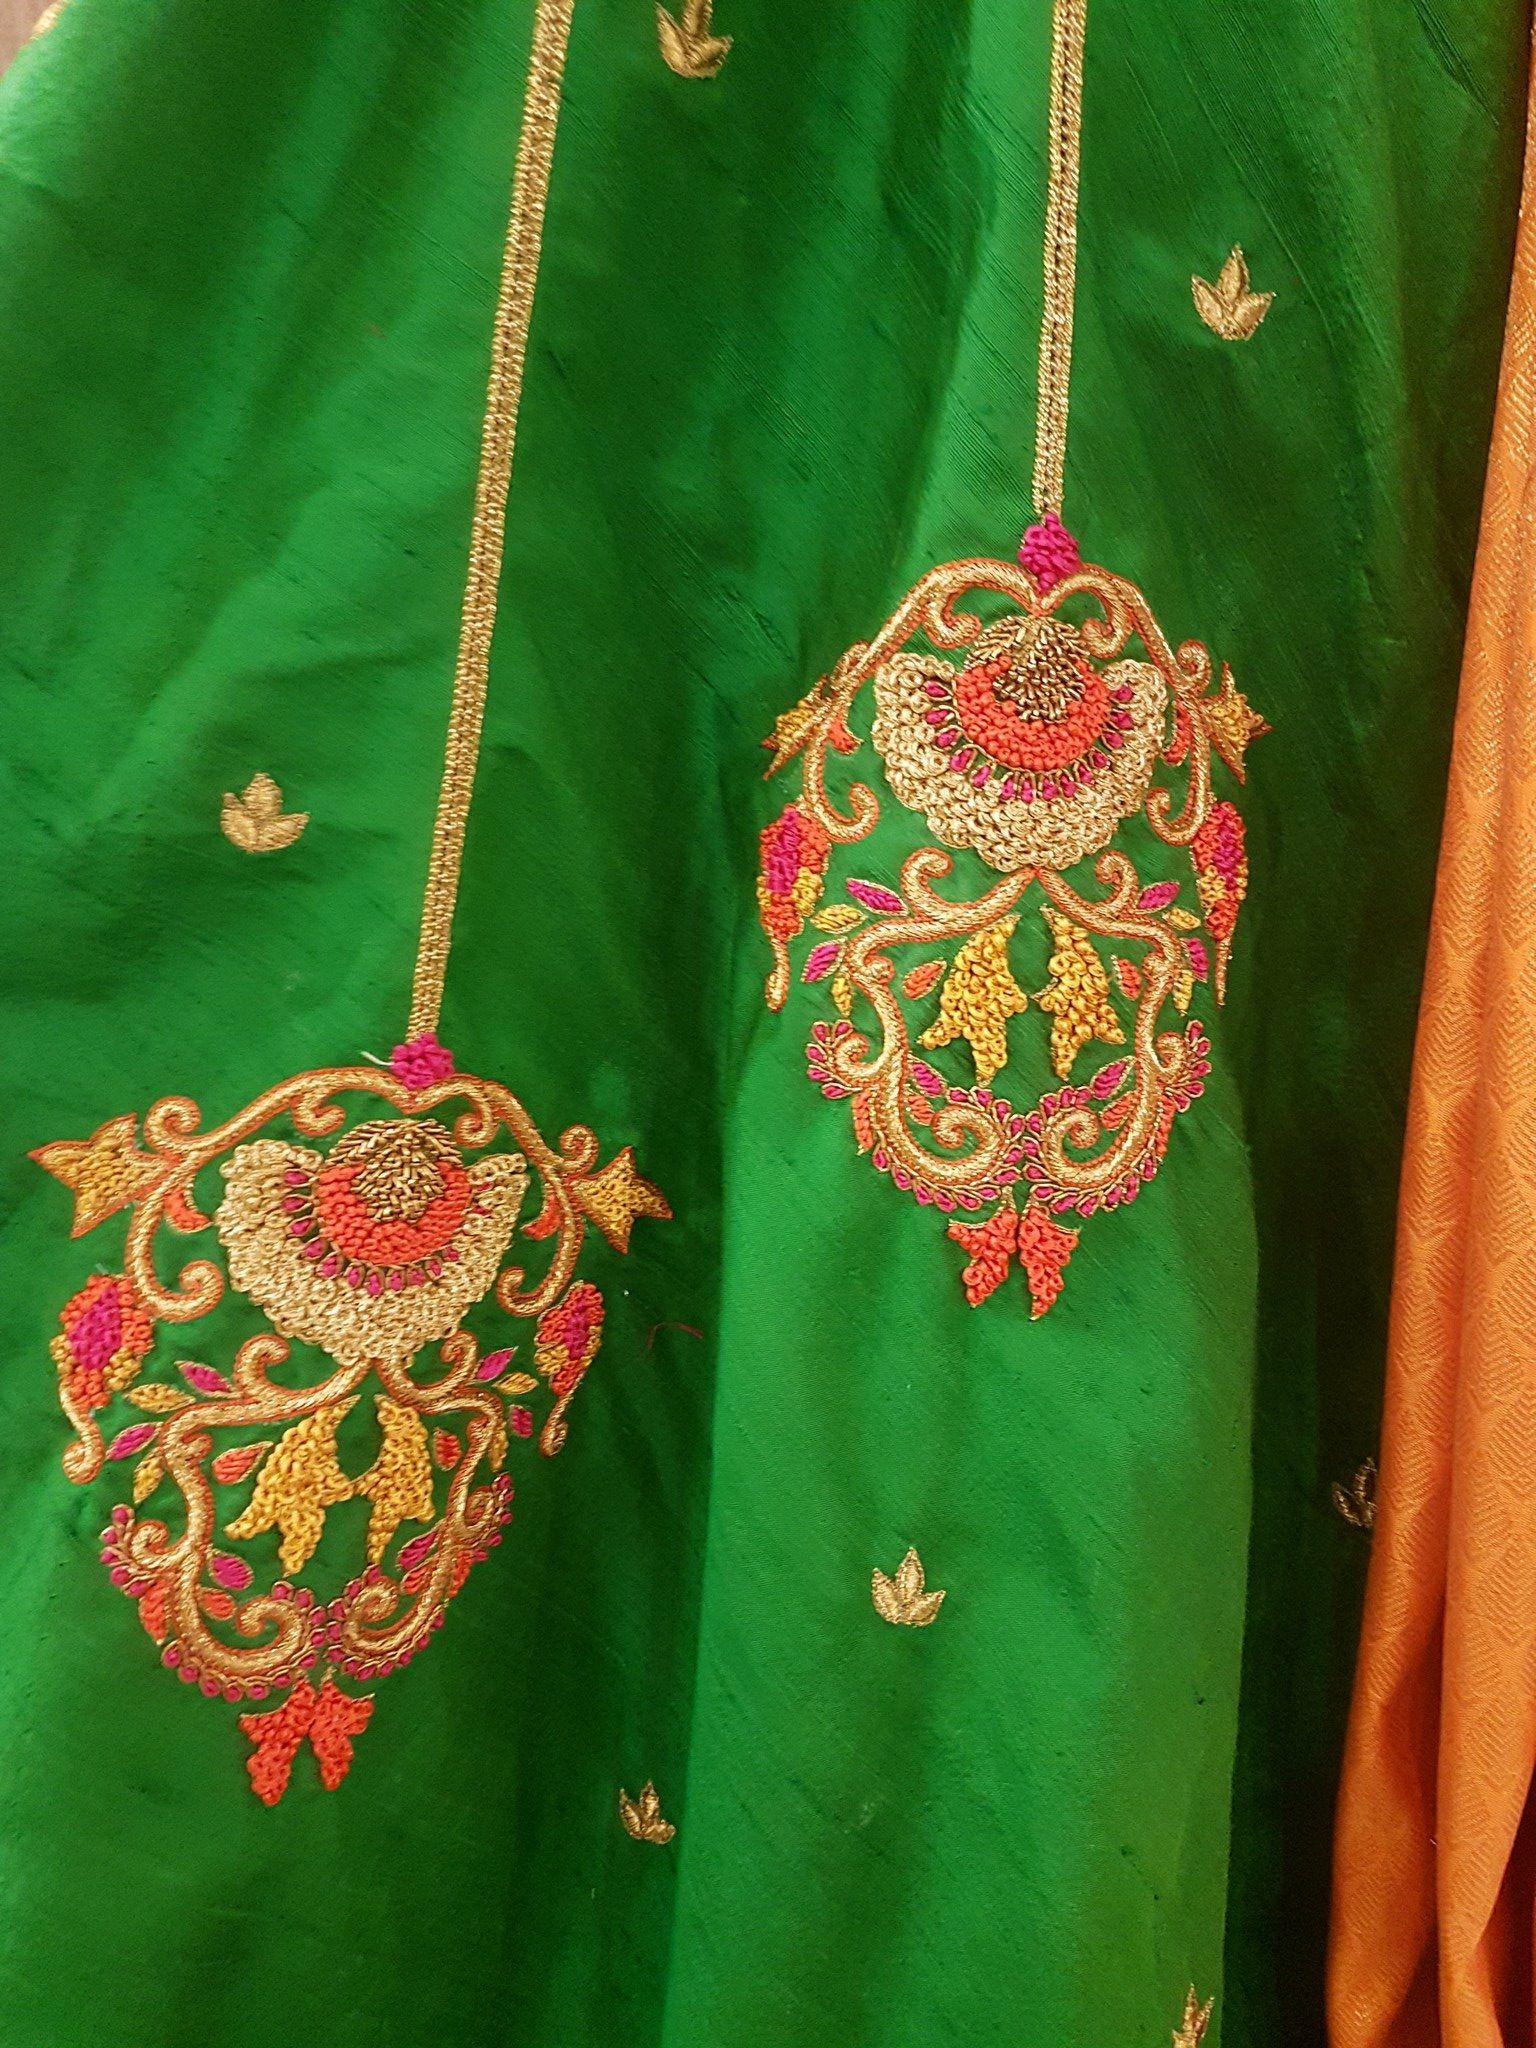 Pin by mansi ambasana on indian and ethnic pinterest blouse